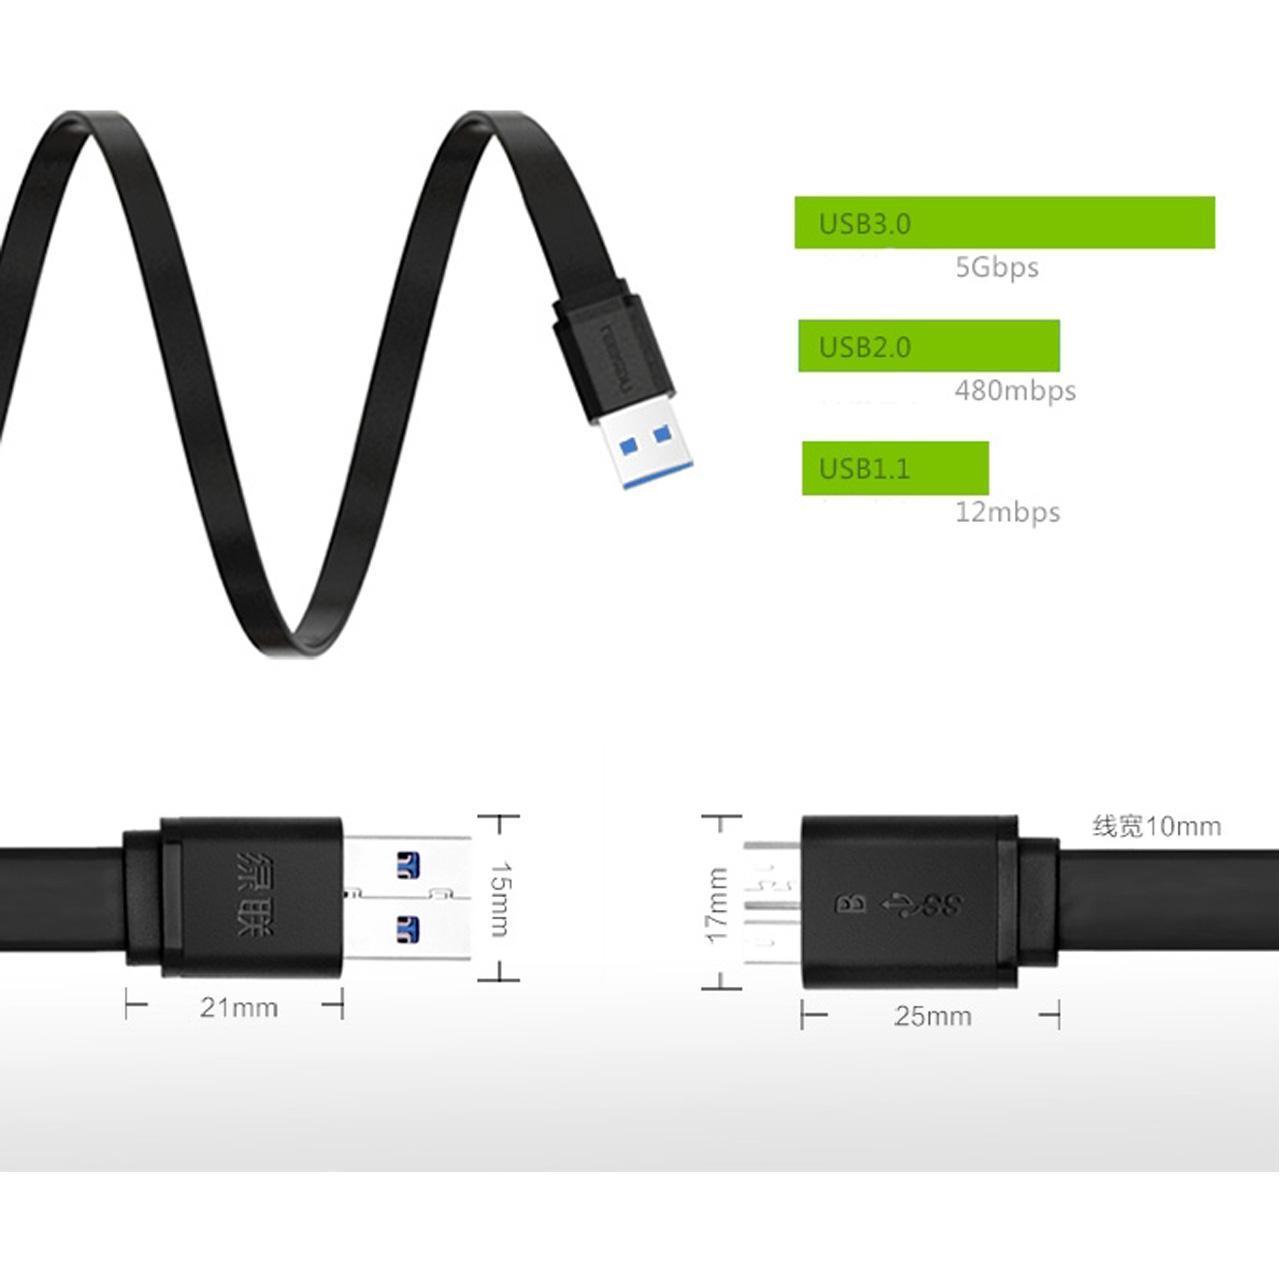 کابل USB 3.0 مارک UGREEN